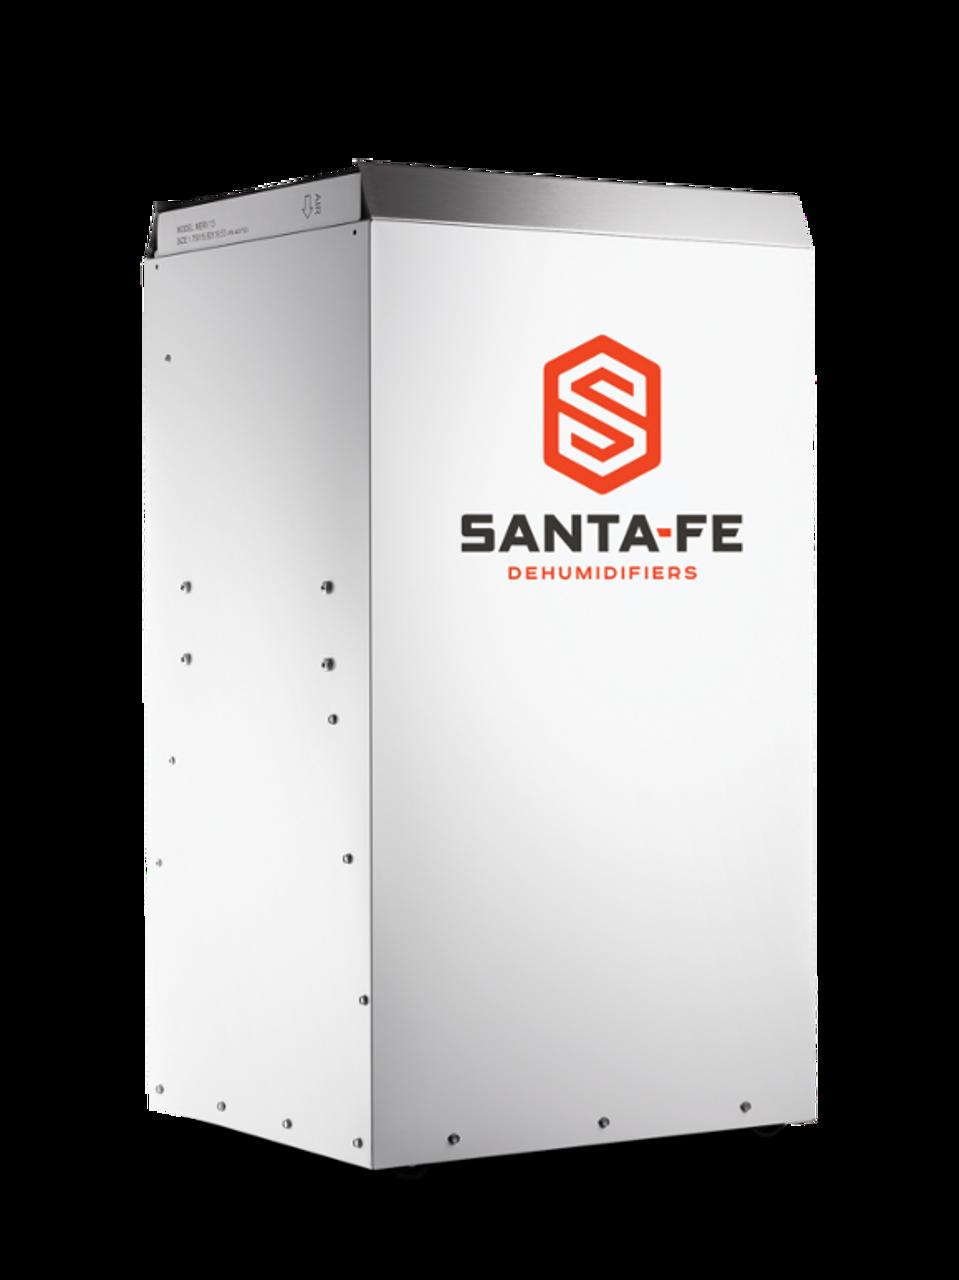 Santa Fe Dehumidifiers